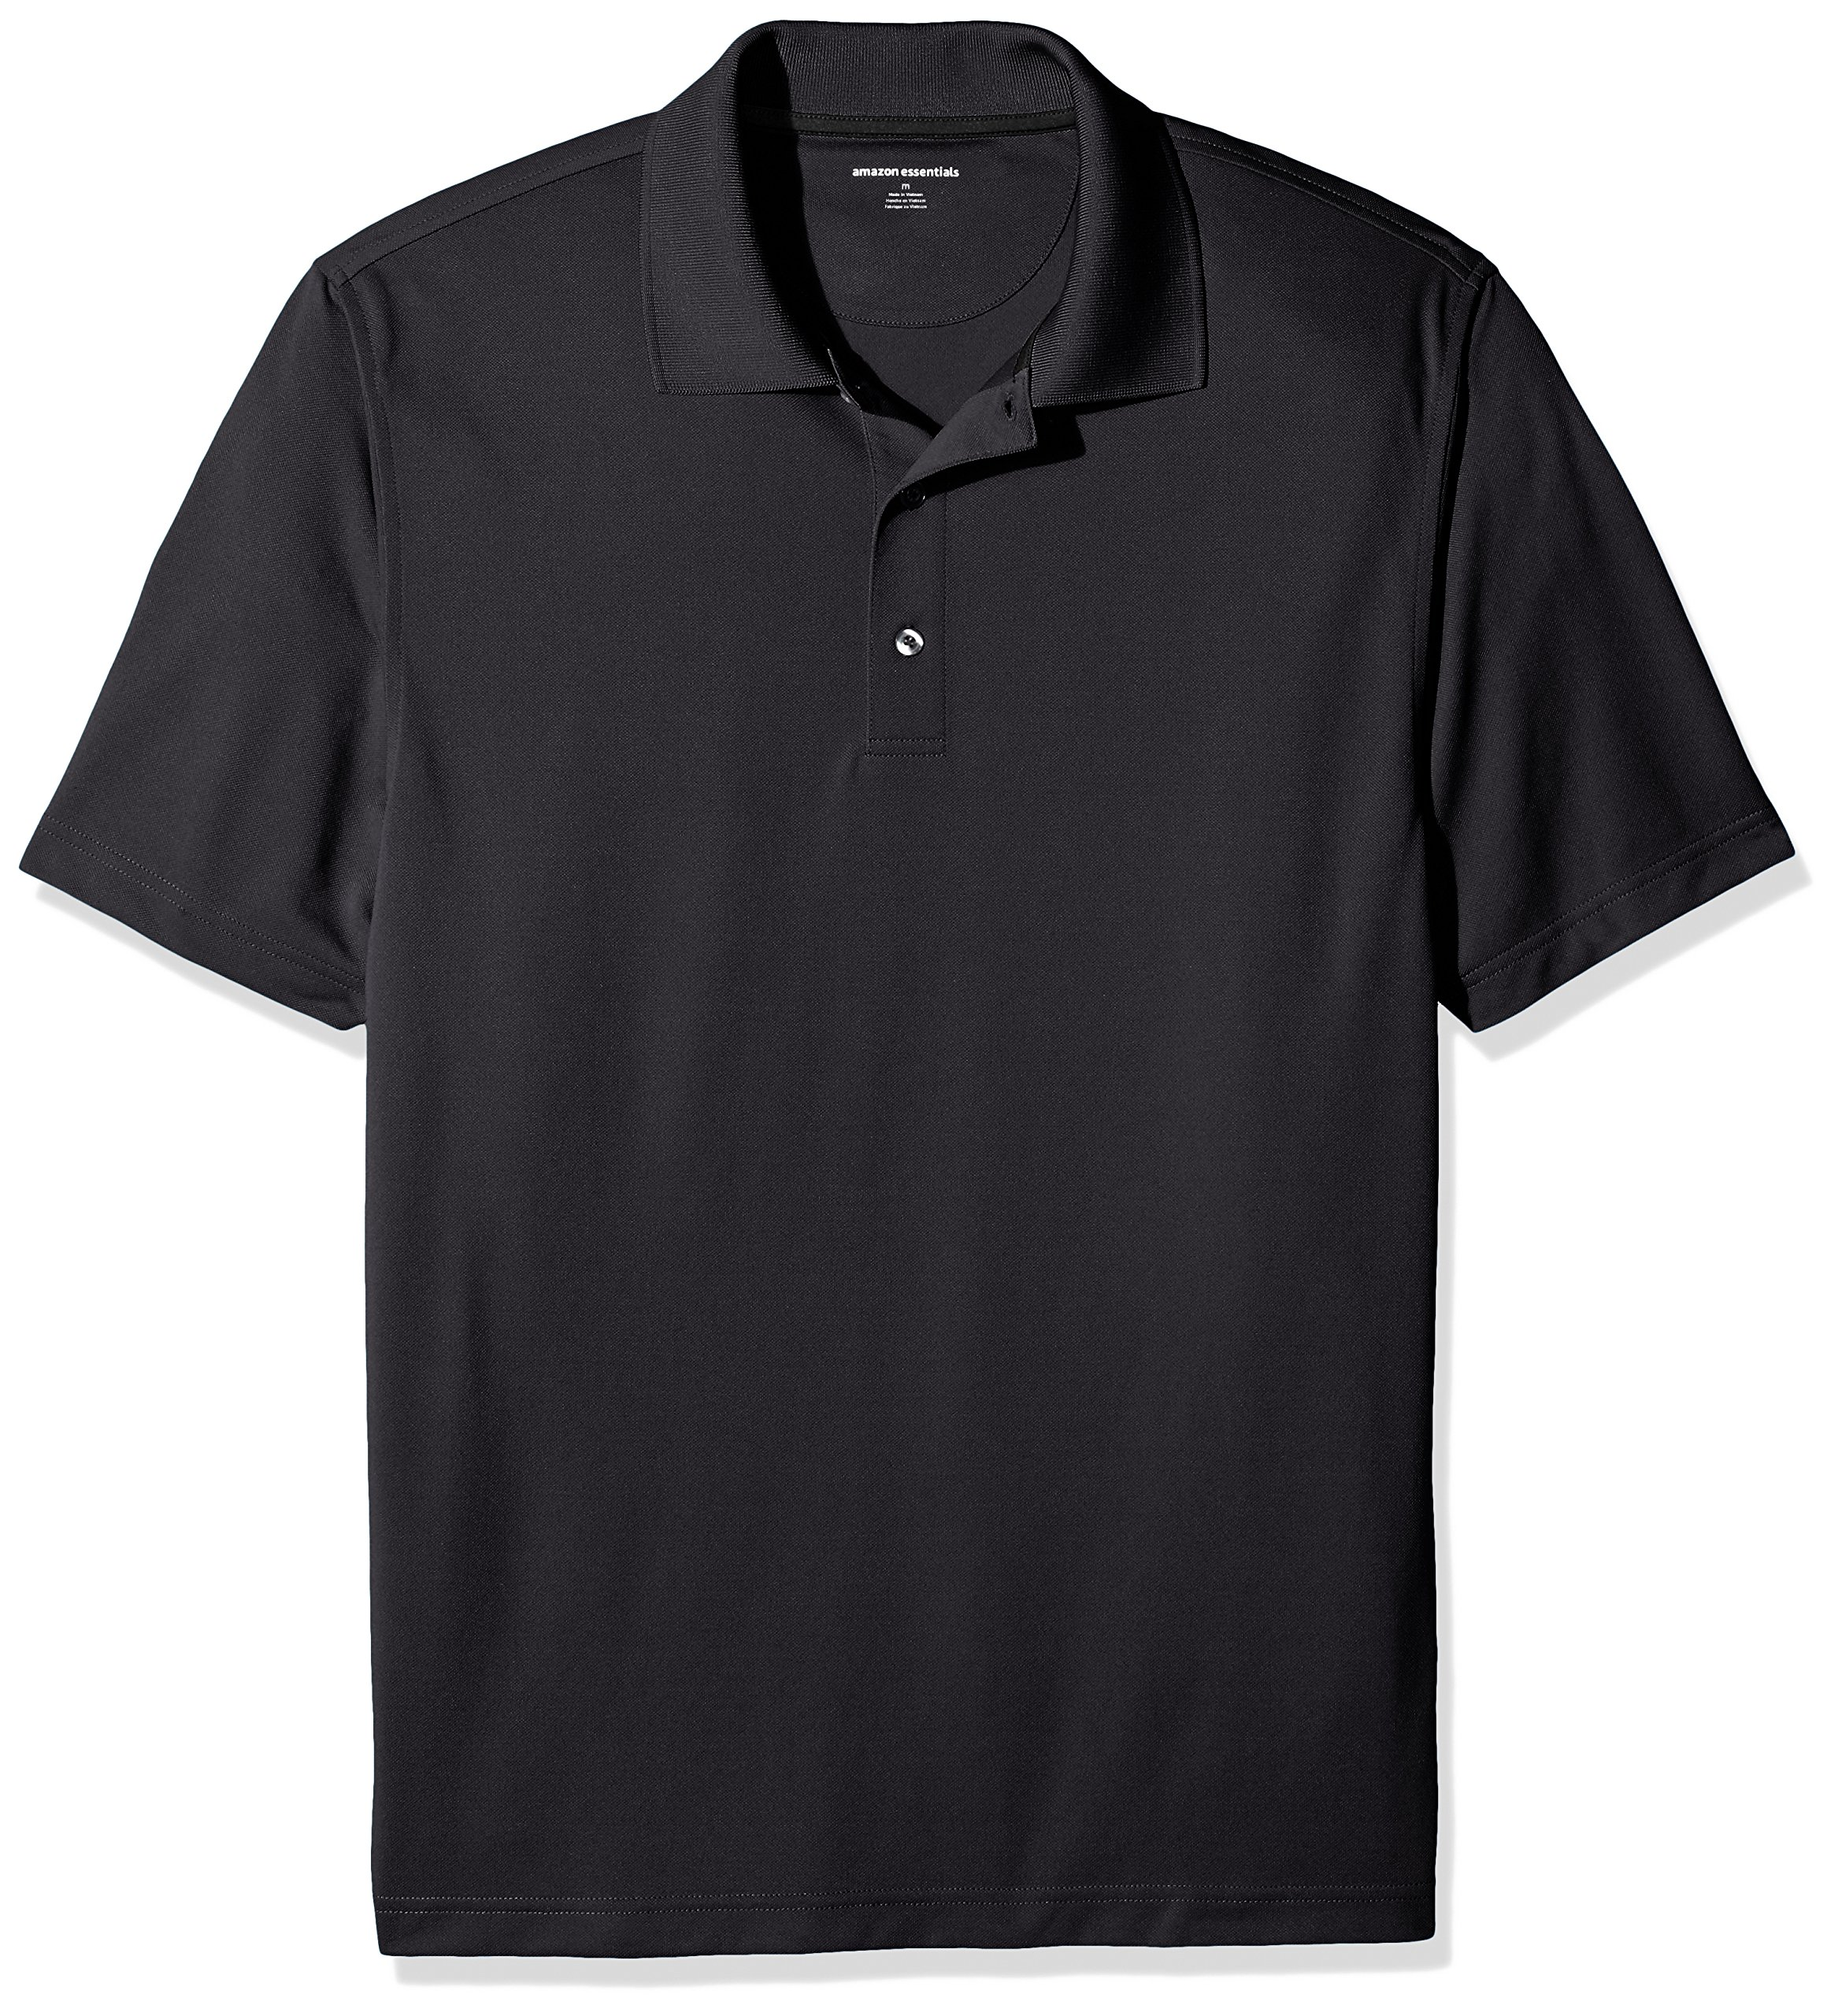 amazon essentials men 39 s regular fit quick dry golf polo